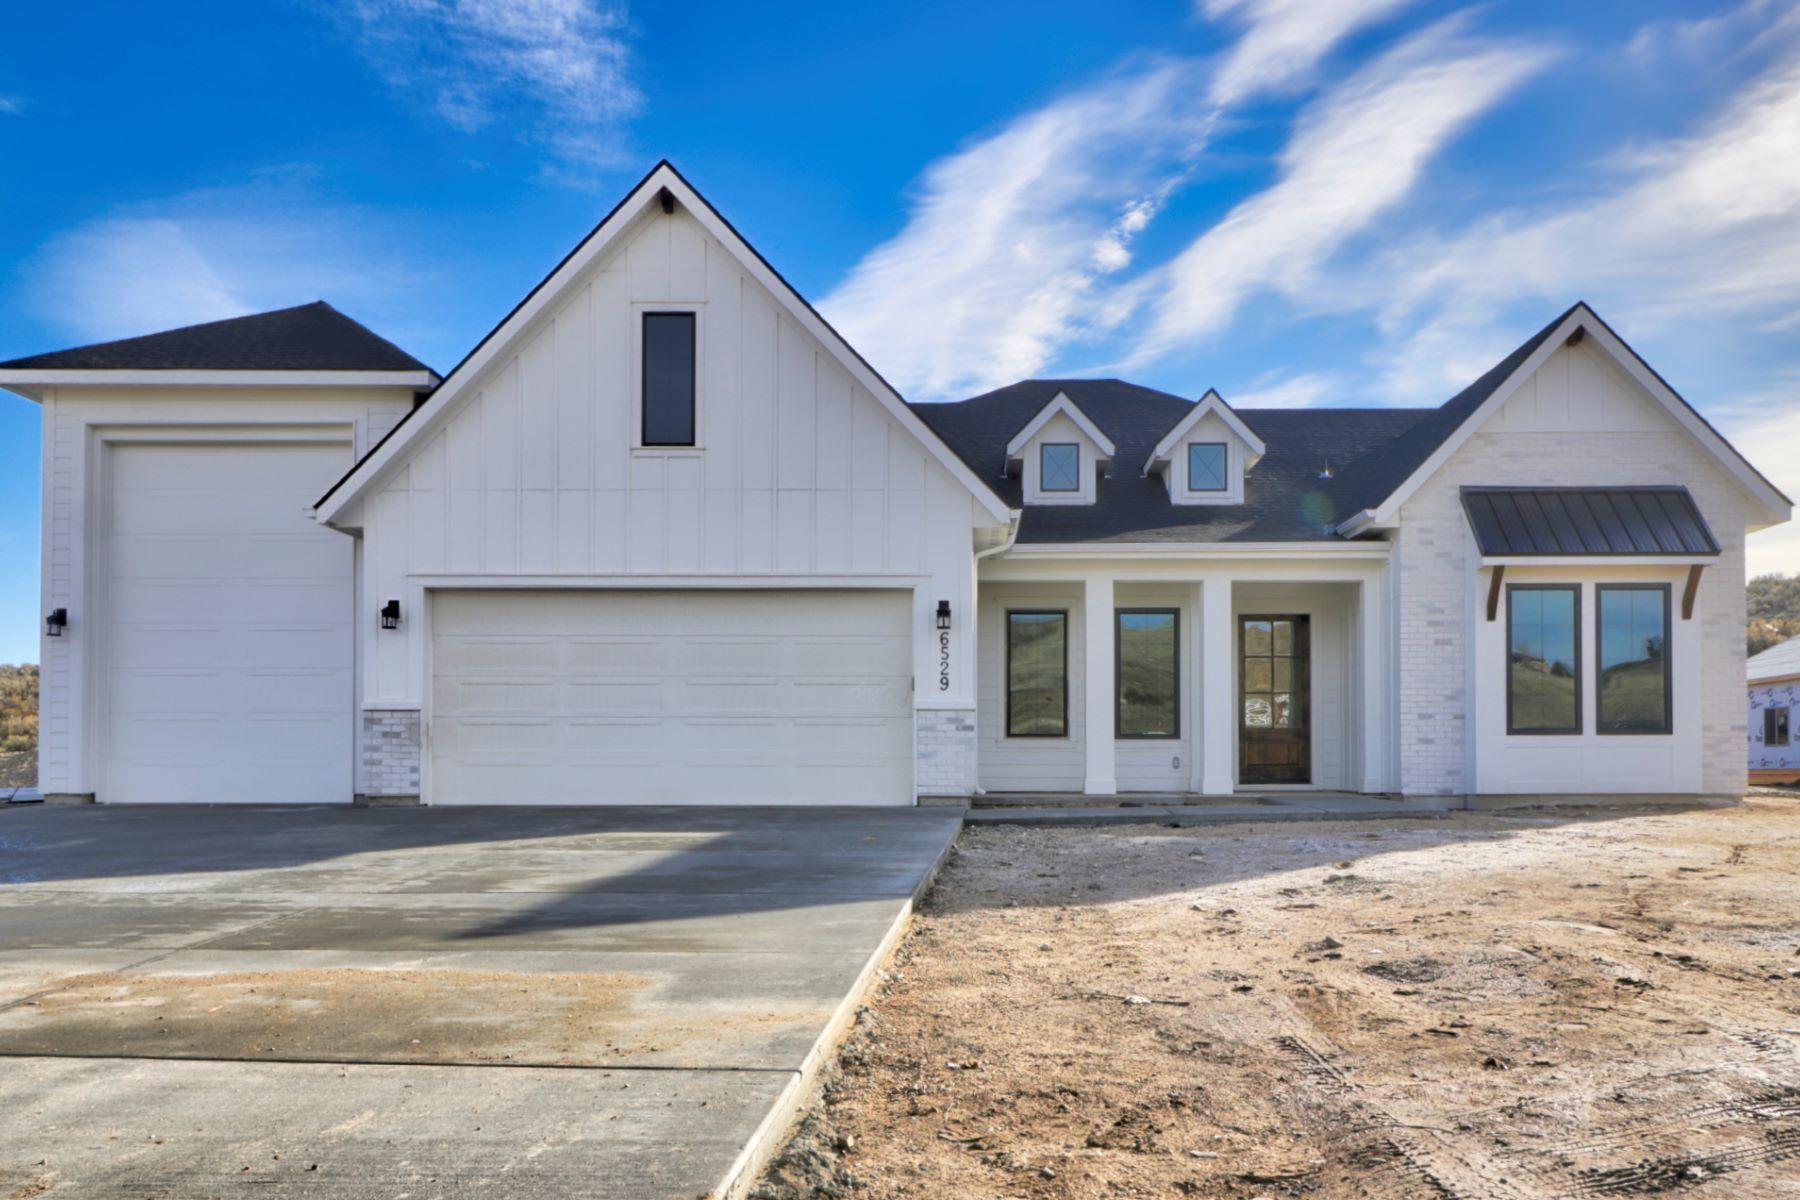 Single Family Homes for Sale at 6580 Sage Basin Way Star, Idaho 83669 United States